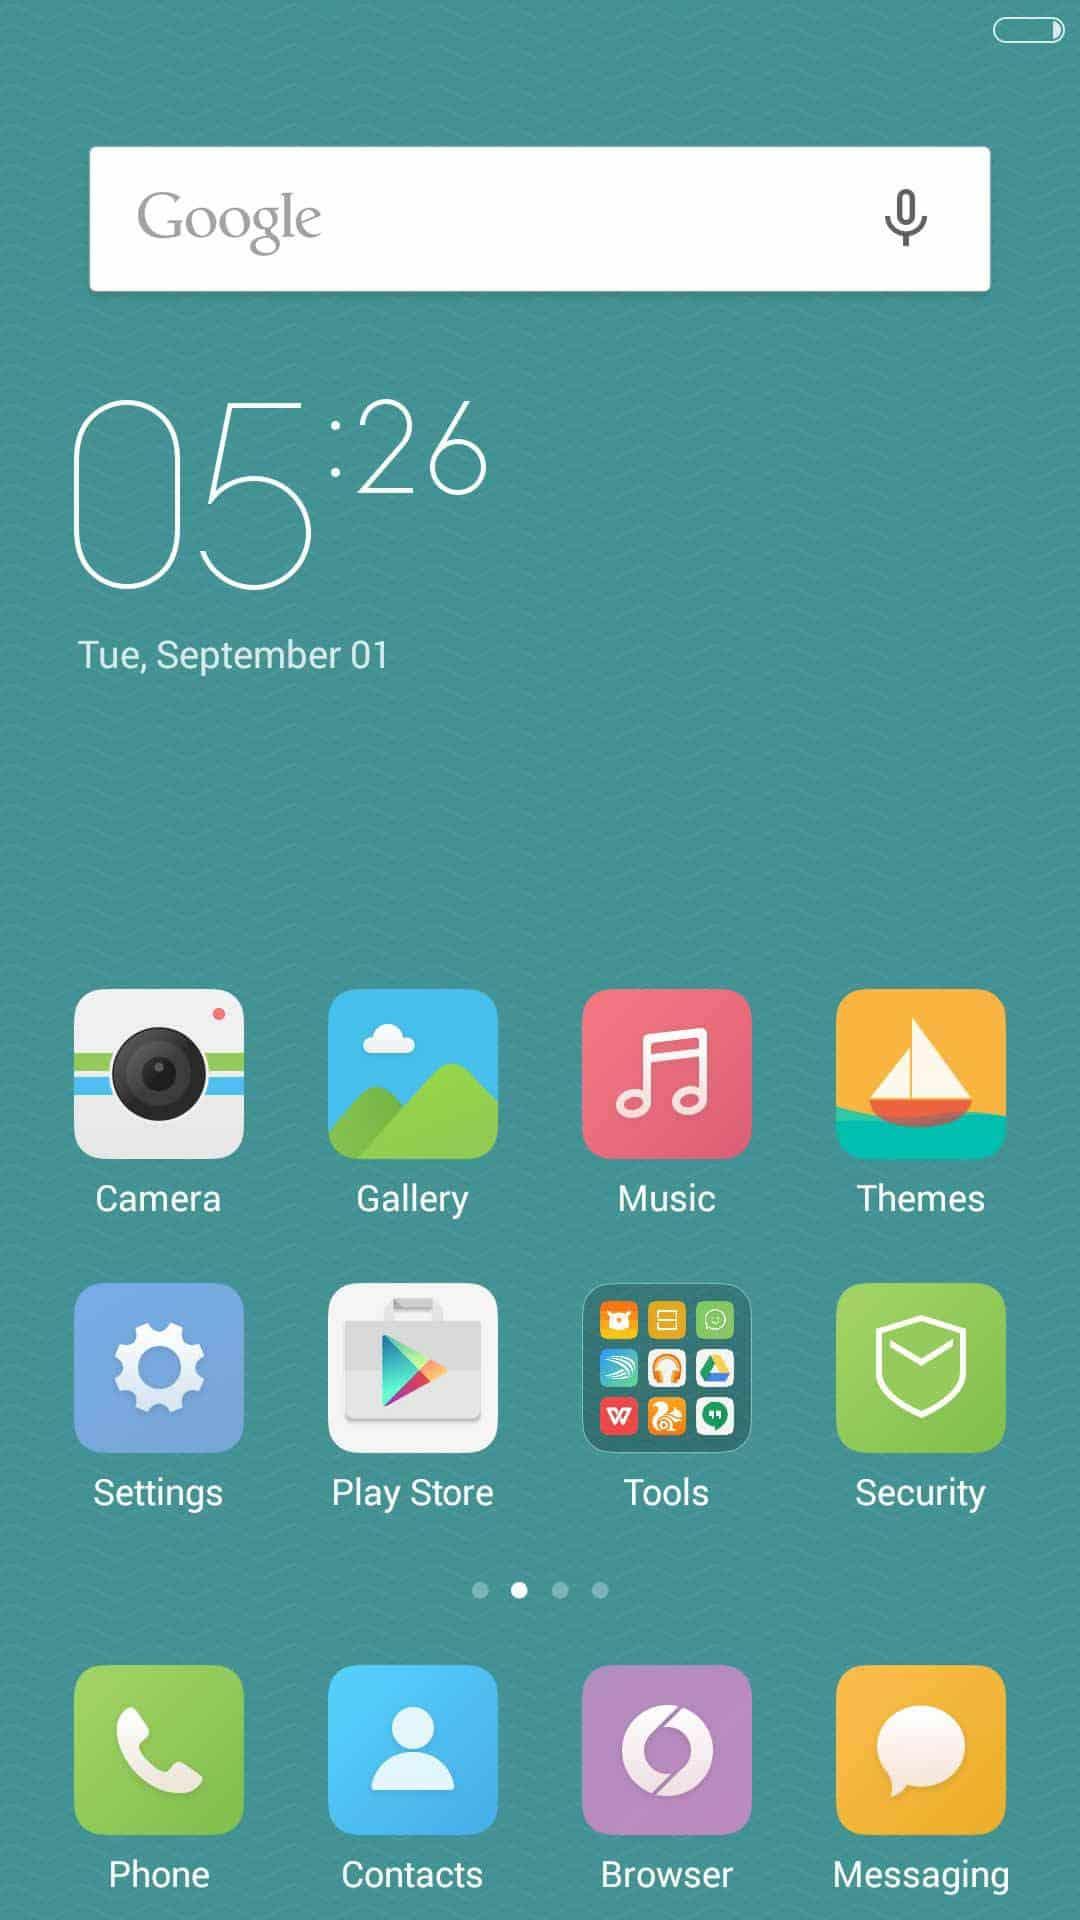 Screenshot 2016 04 10 04 44 41 com.android.thememanager